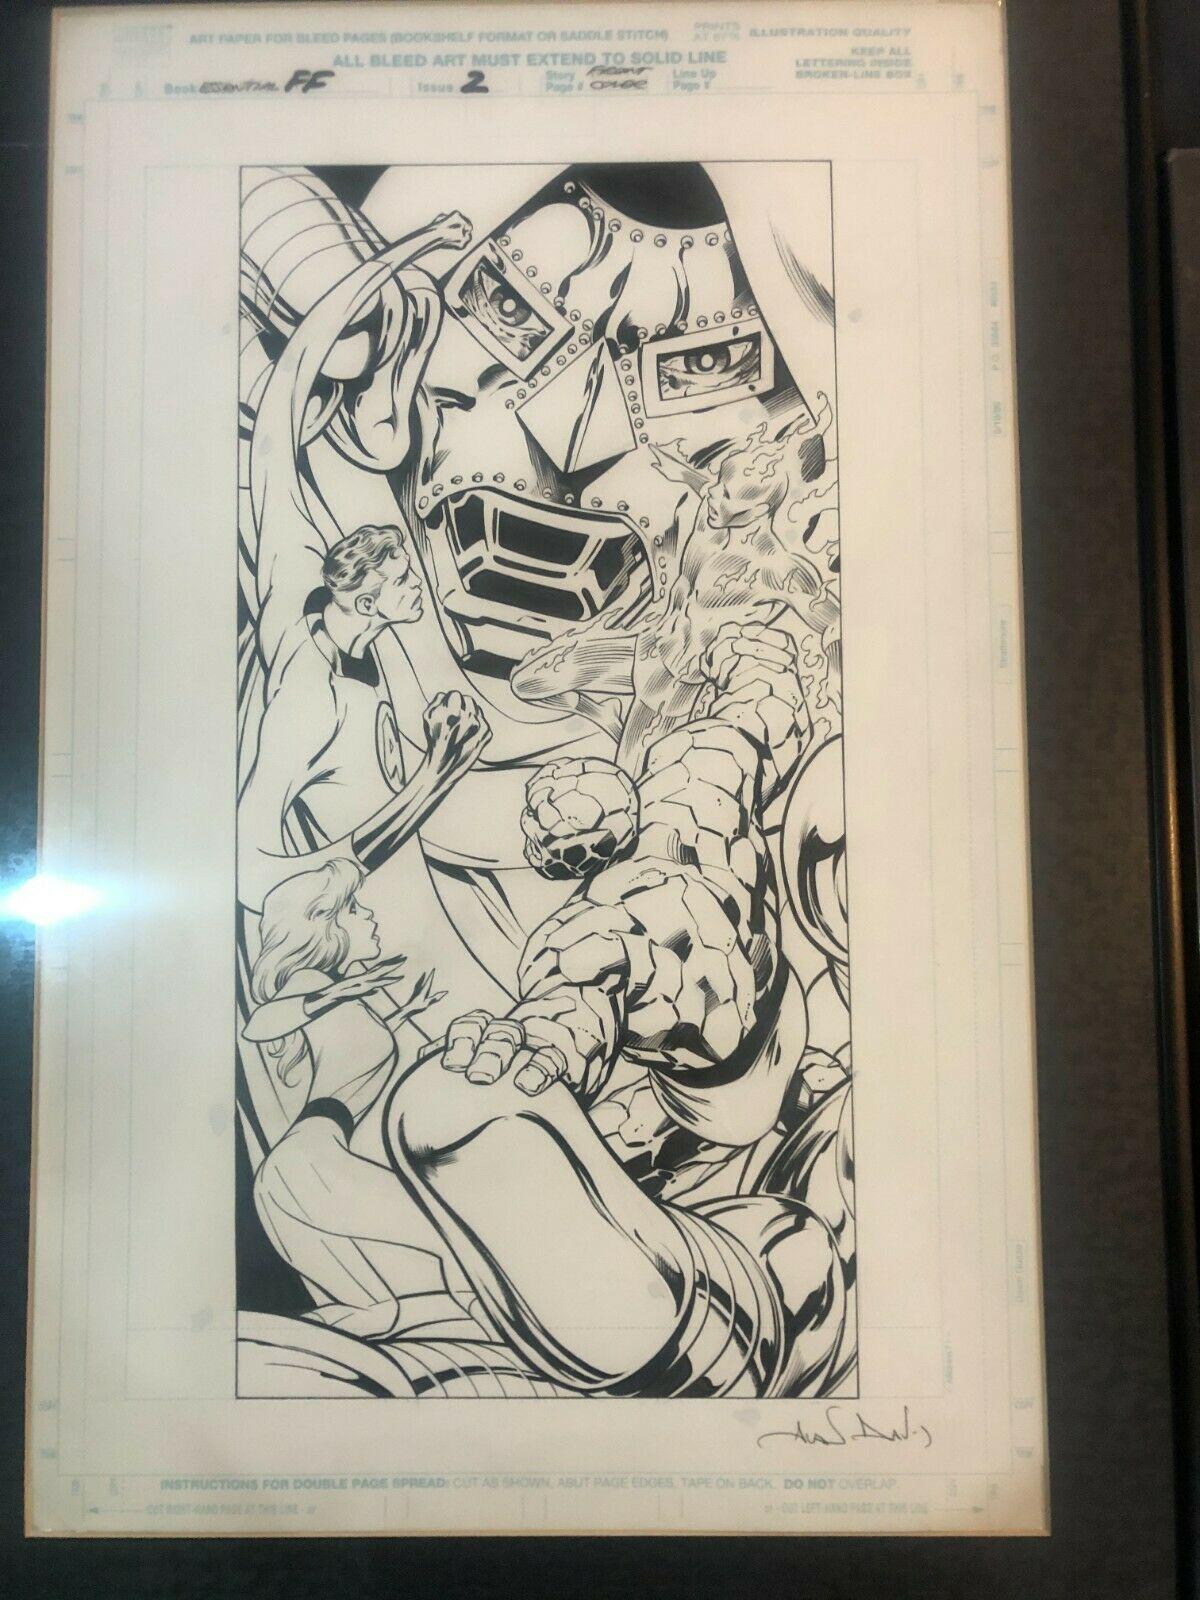 Alan-Davis-Original-Comic-Art-Fantastic-Four-Cover